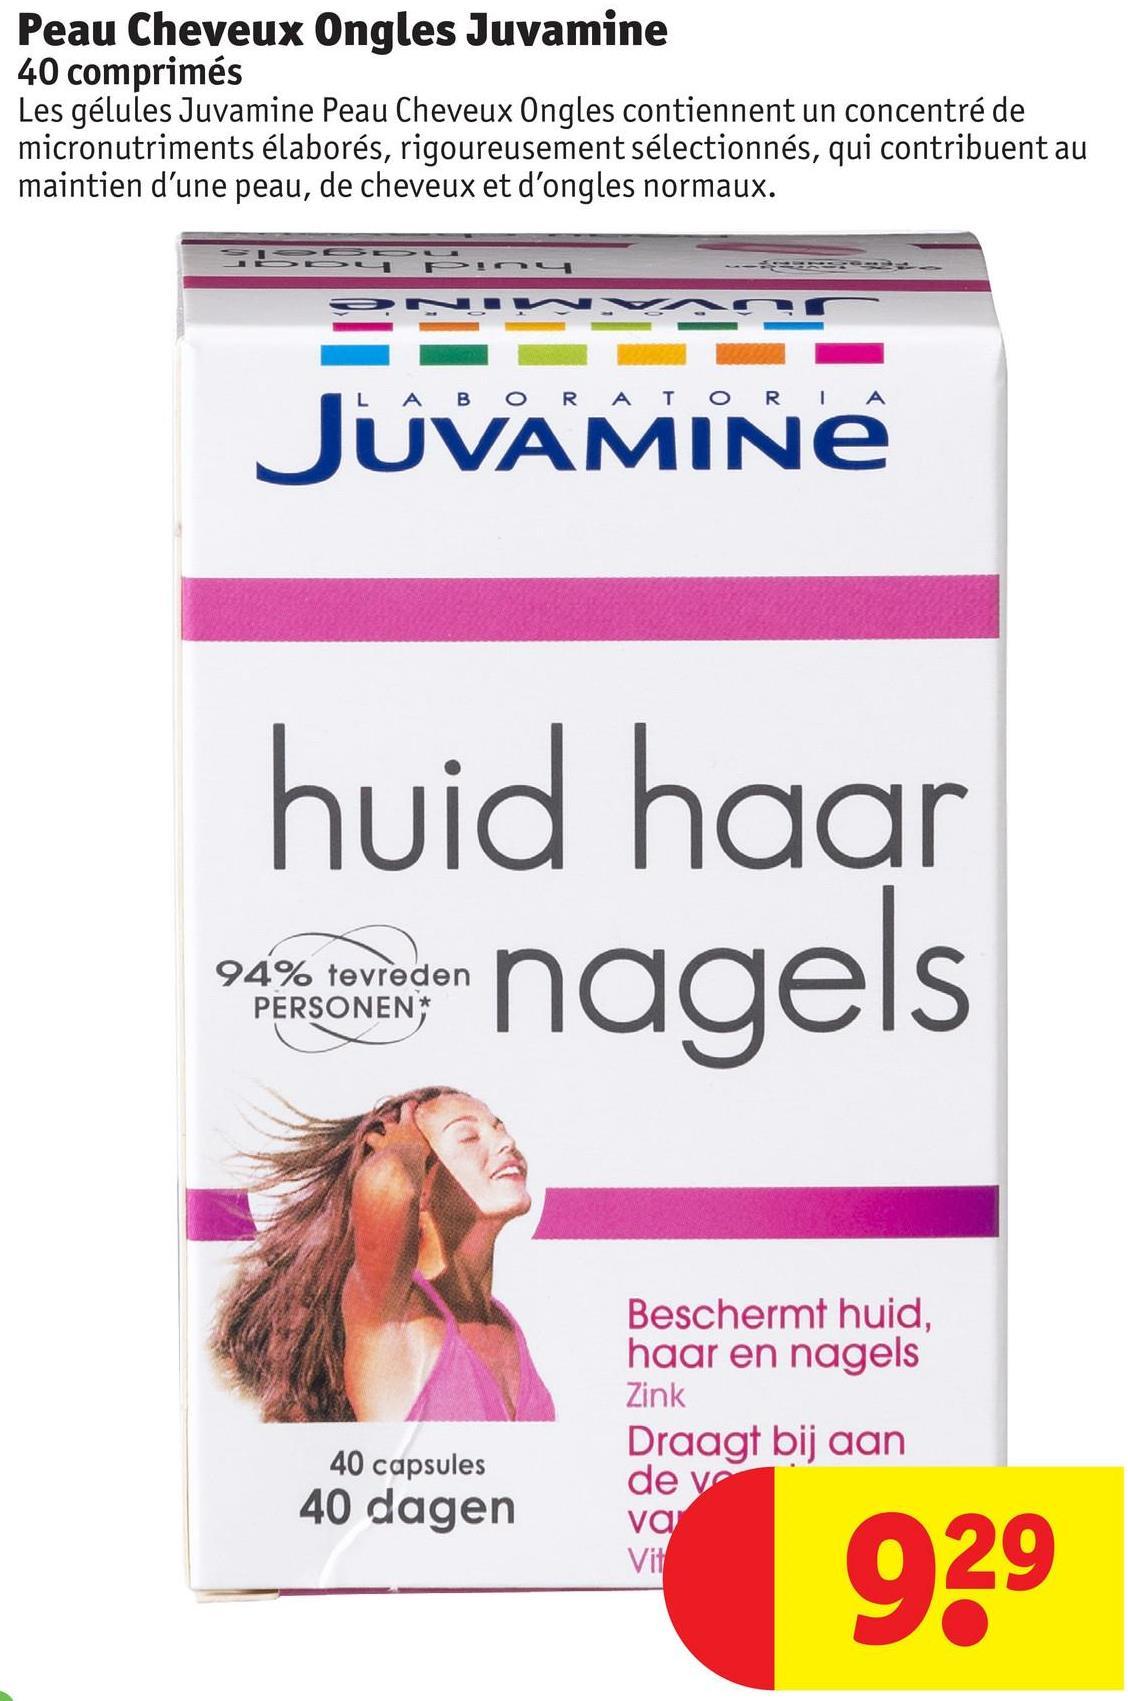 Peau Cheveux Ongles Juvamine 40 comprimés Les gélules Juvamine Peau Cheveux Ongles contiennent un concentré de micronutriments élaborés, rigoureusement sélectionnés, qui contribuent au maintien d'une peau, de cheveux et d'ongles normaux. 3D- Pin4 P9VVAAS LABORATORIA UVAMINE huid haar o entender nagels 94% tevreden PERSONEN Beschermt huid, haar en nagels Zink Draagt bij aan de ve va Vit 40 capsules 40 dagen 929